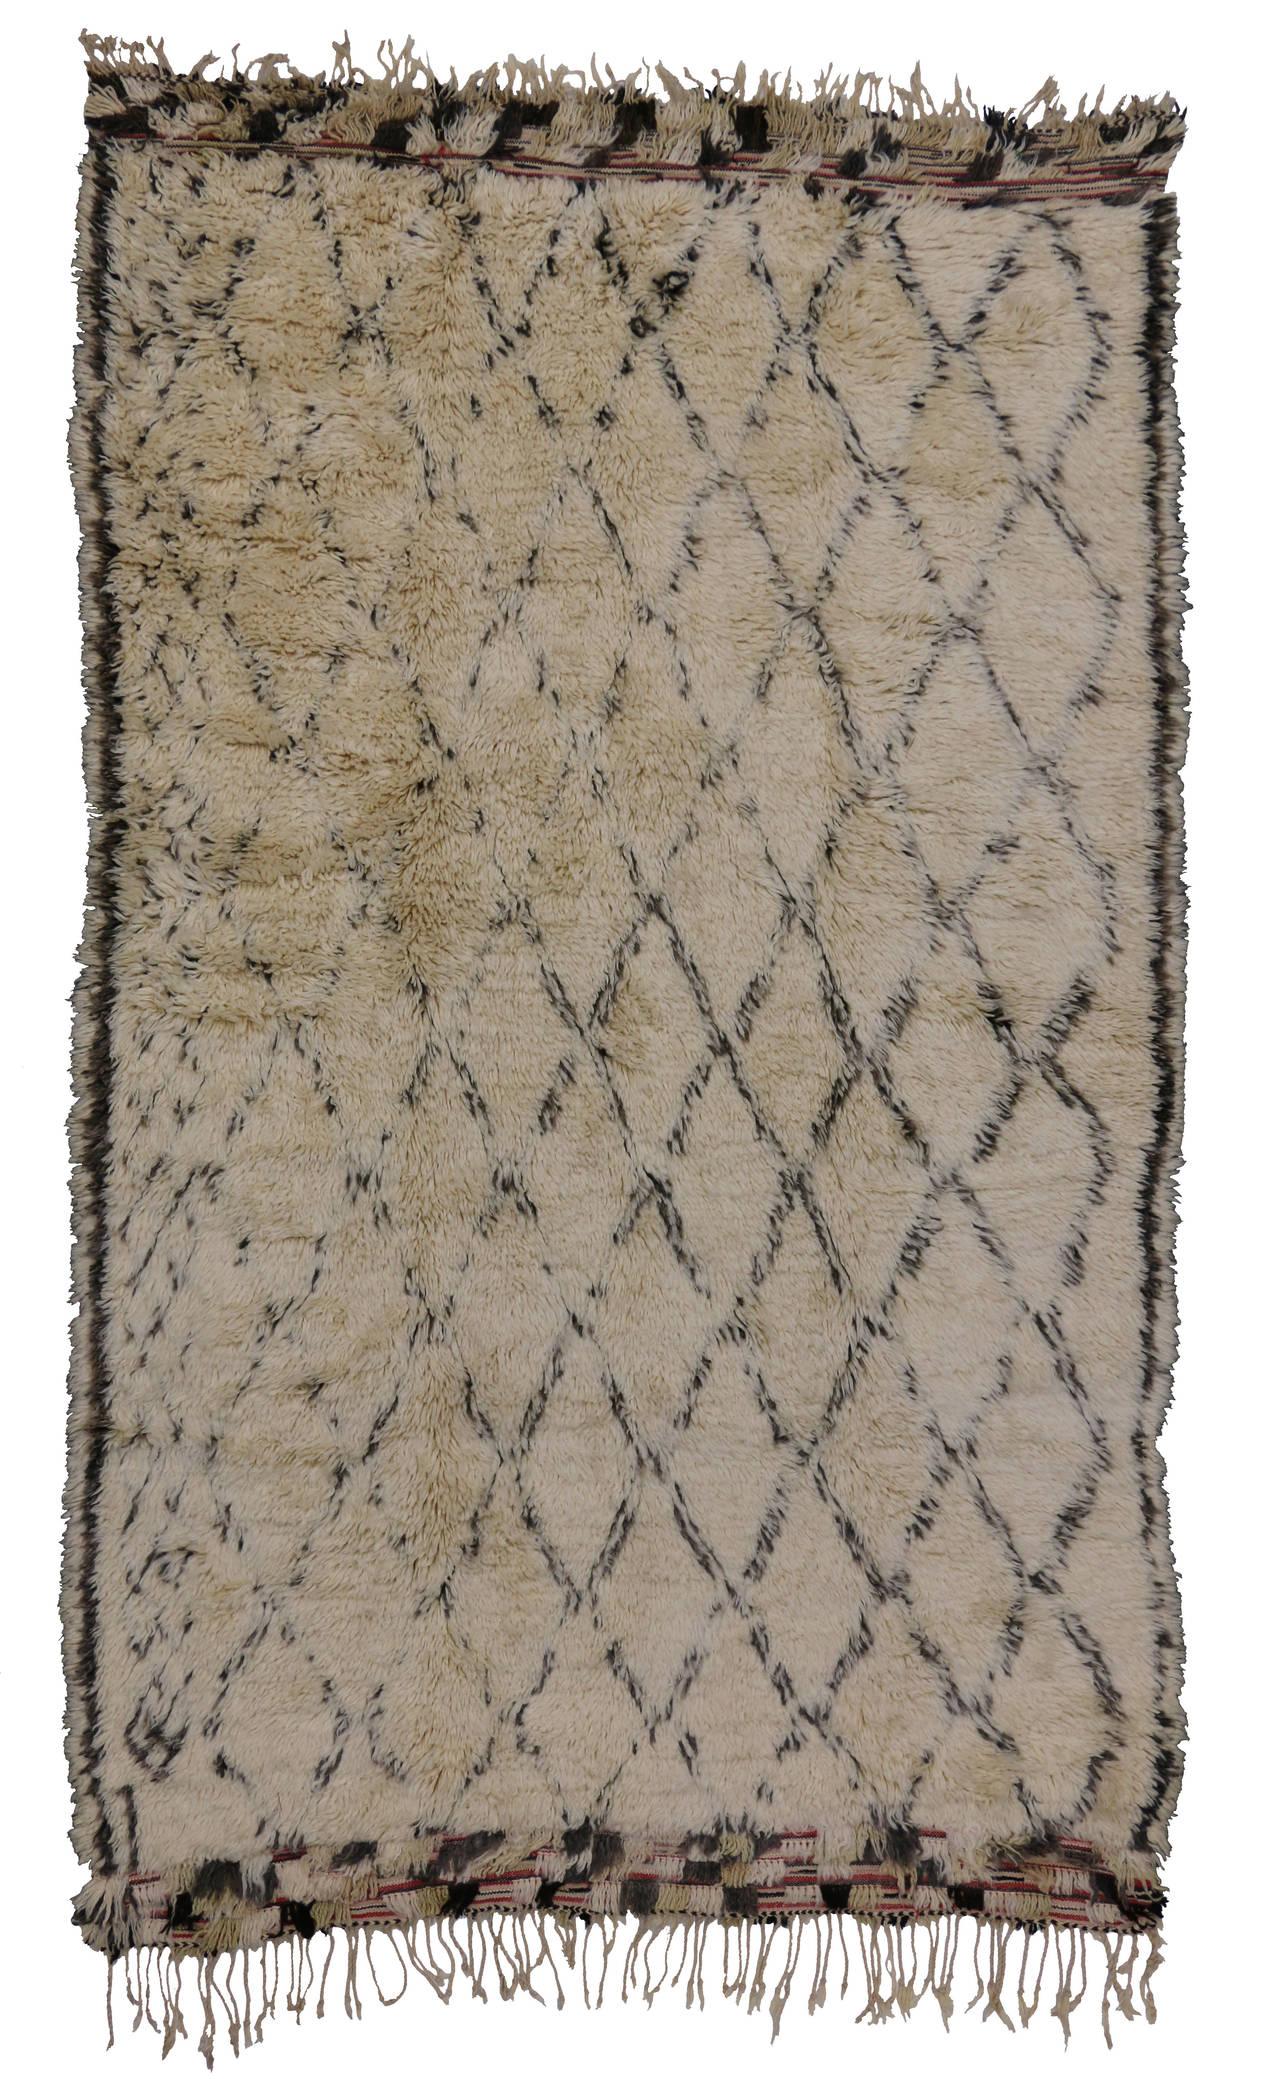 mid century modern beni ourain moroccan rug at 1stdibs. Black Bedroom Furniture Sets. Home Design Ideas